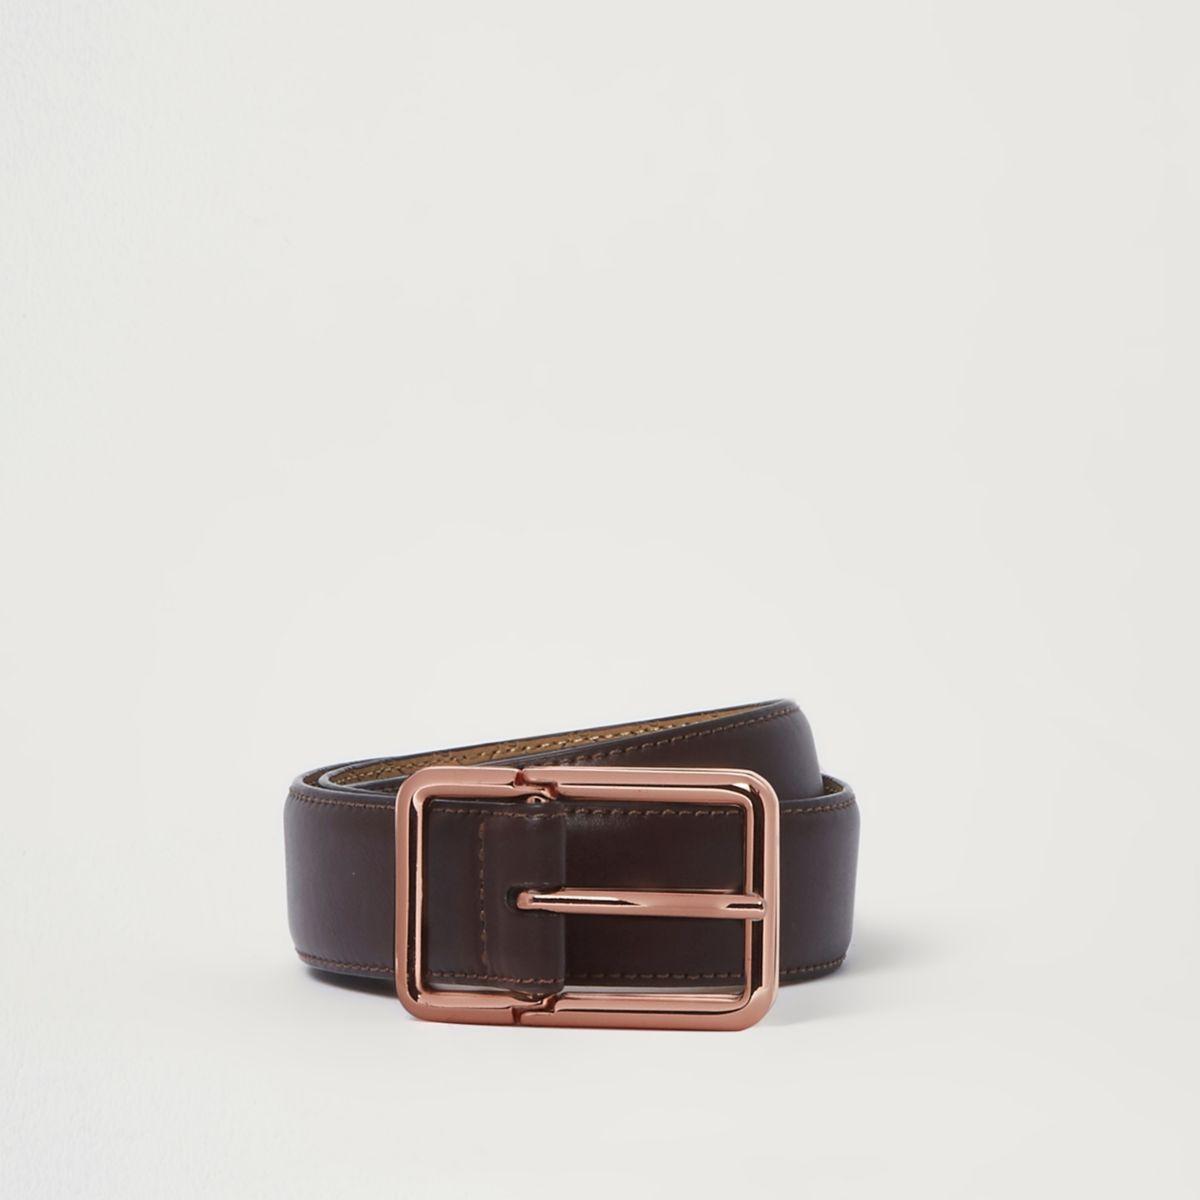 Brown rose gold tone buckle belt